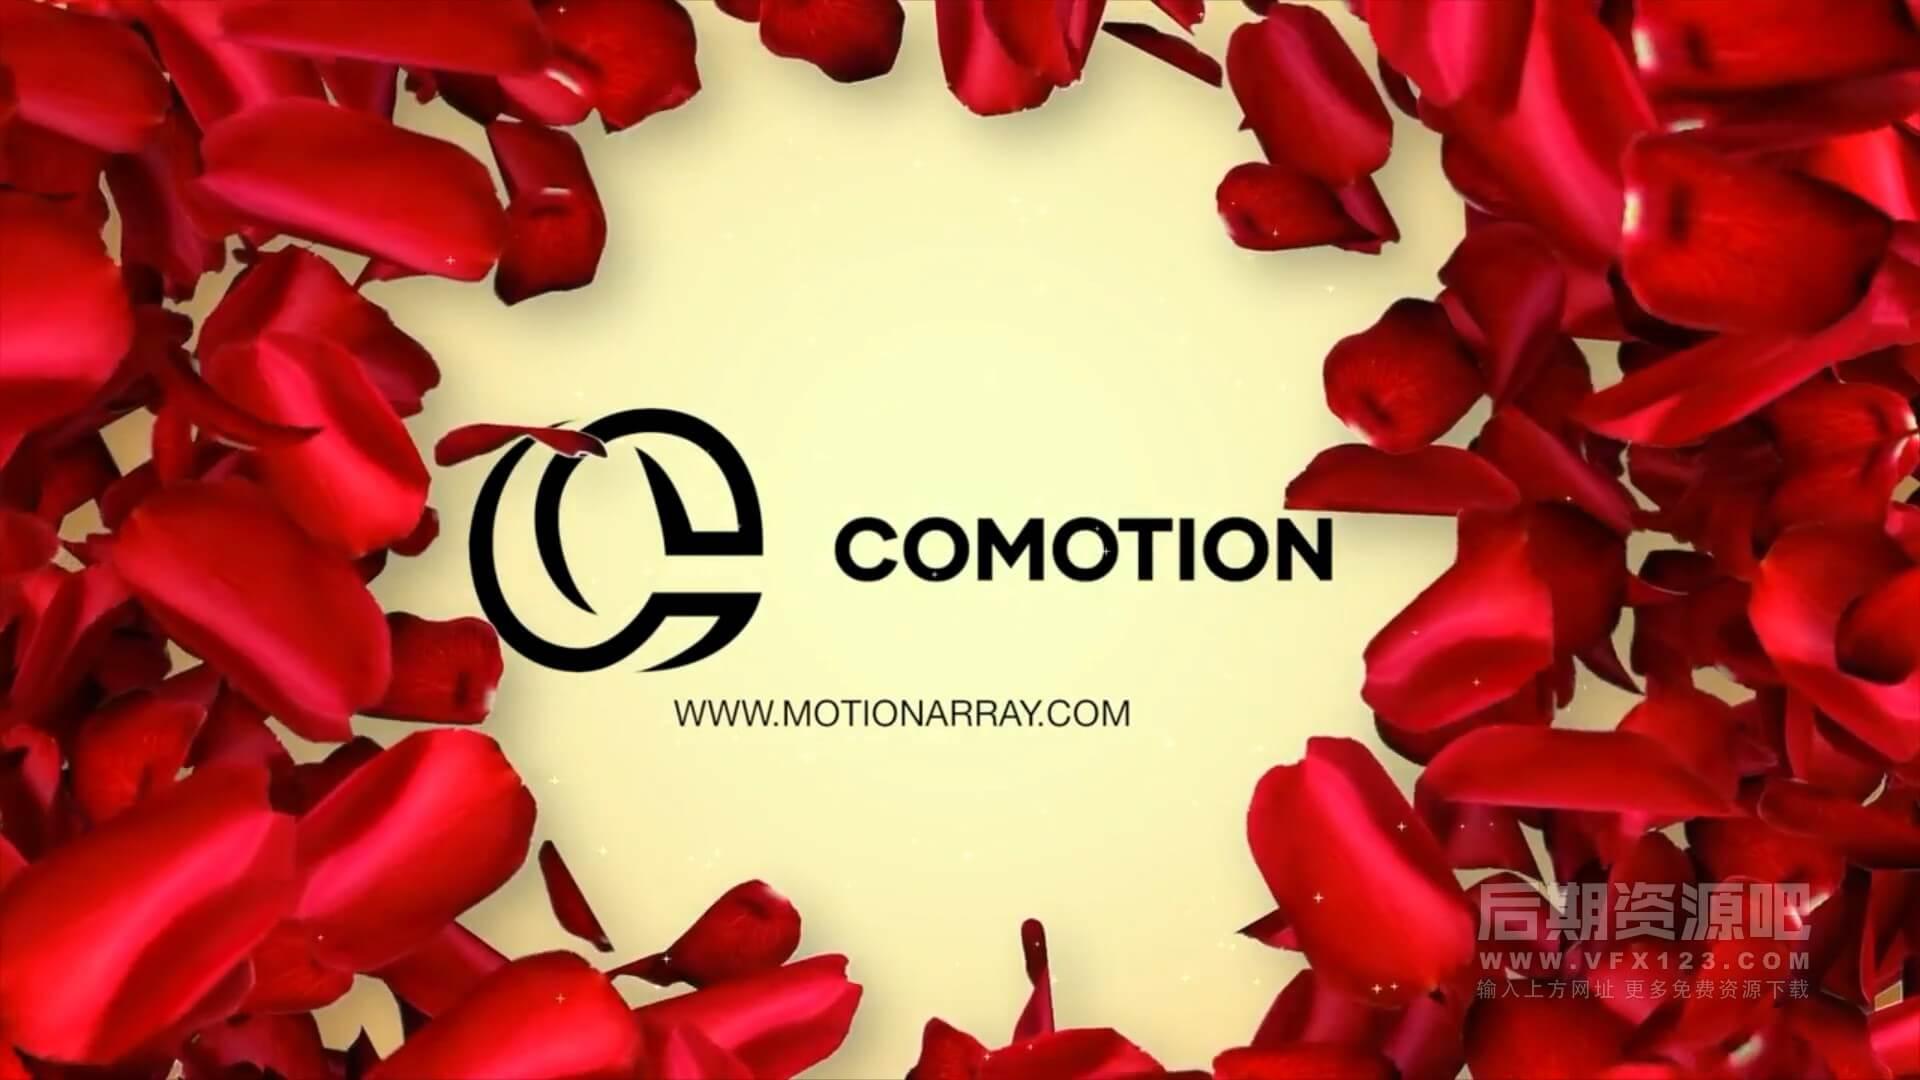 fcpx主题模板 婚礼MV开场婚庆公司徽标宣传片头 Romantic logo